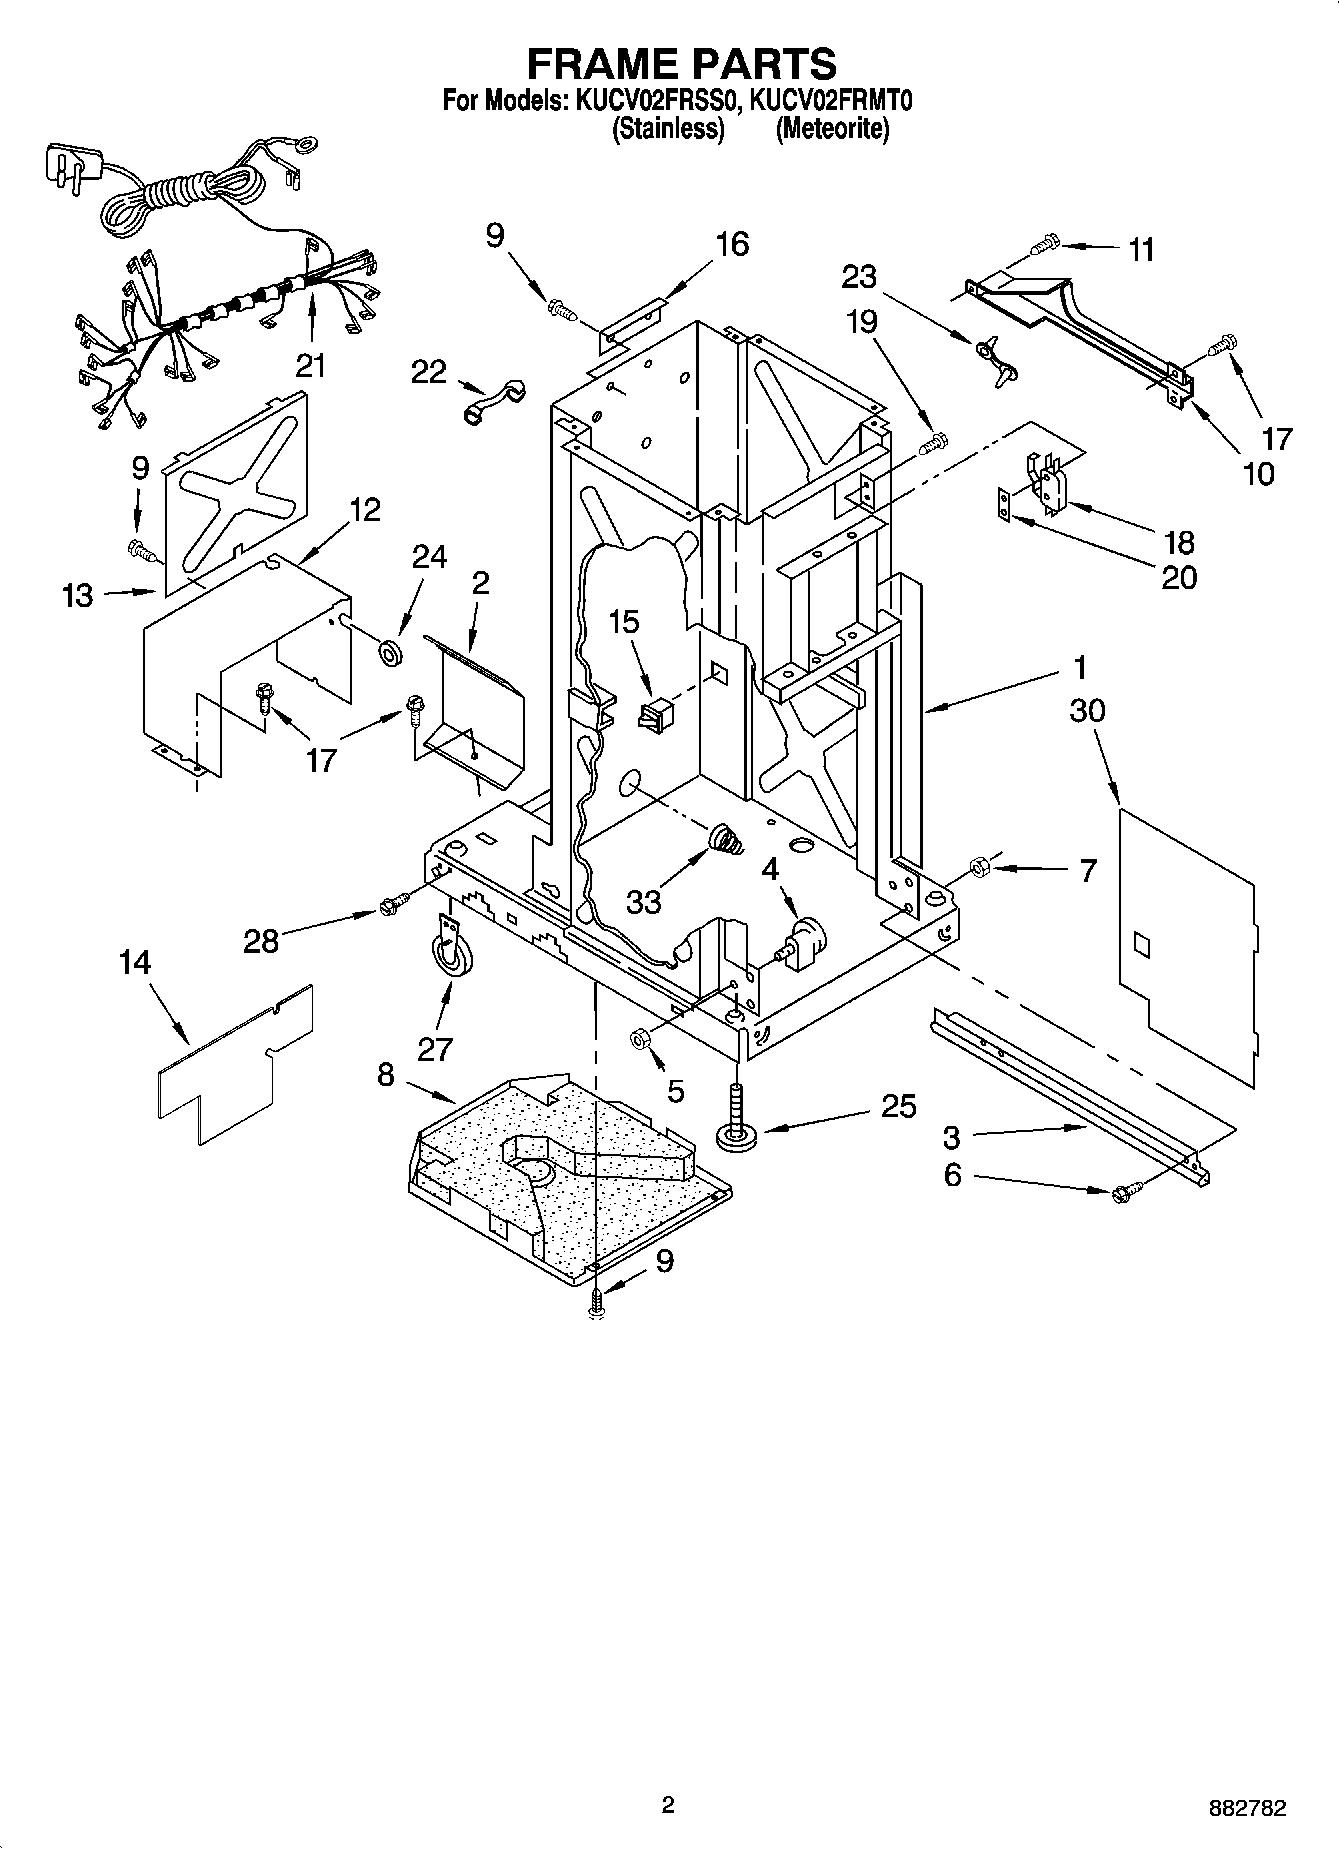 KUCV02FRMT0